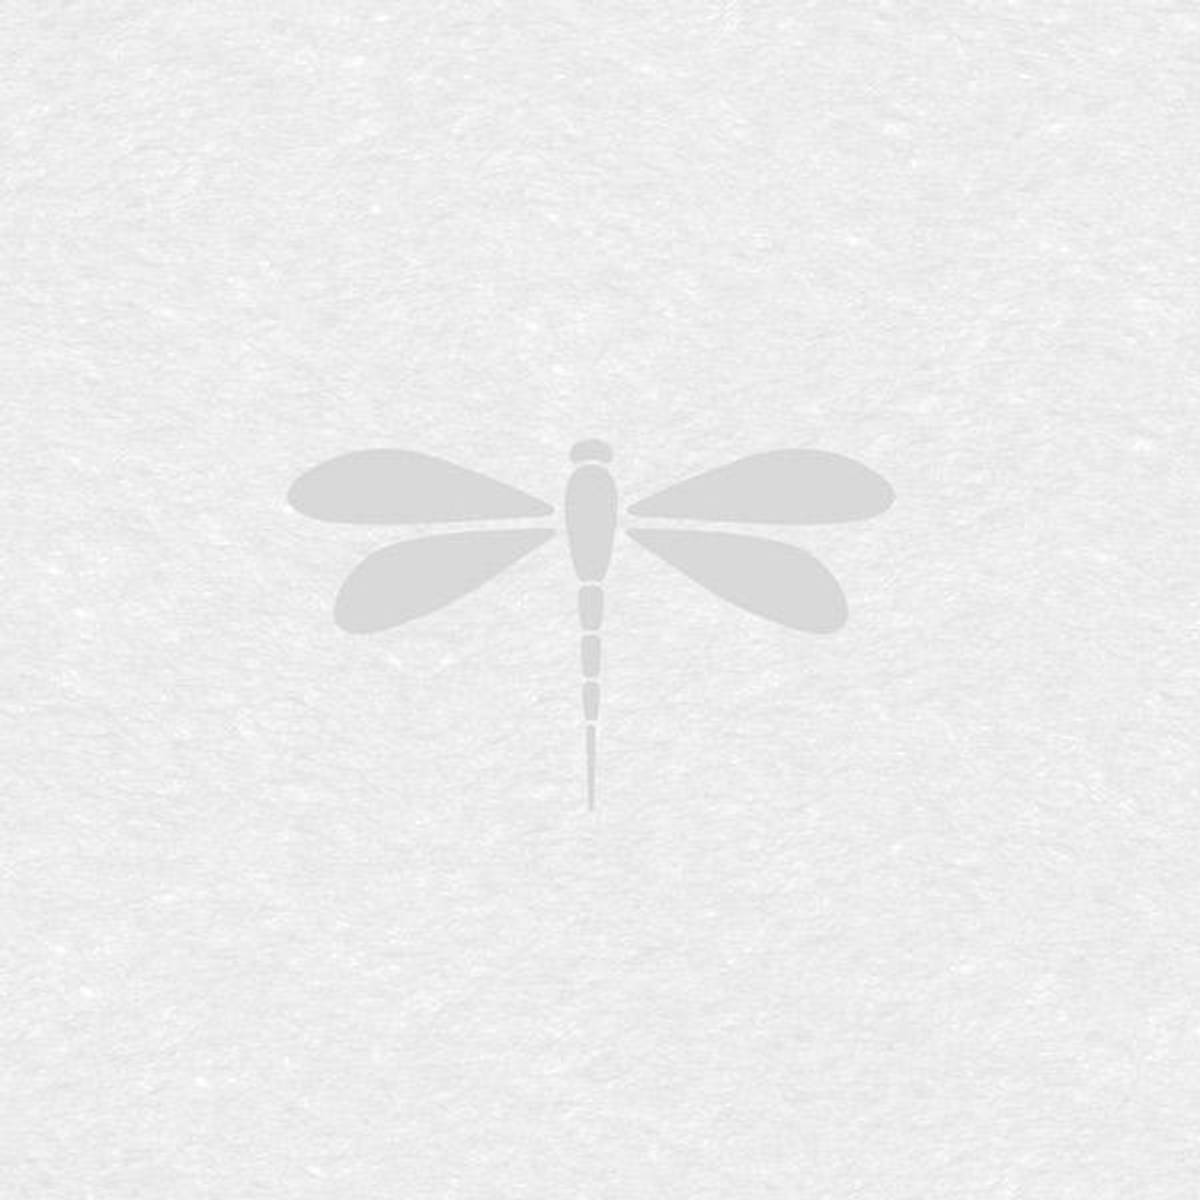 Vareprøve: Static Premium Nibella vindusfolie